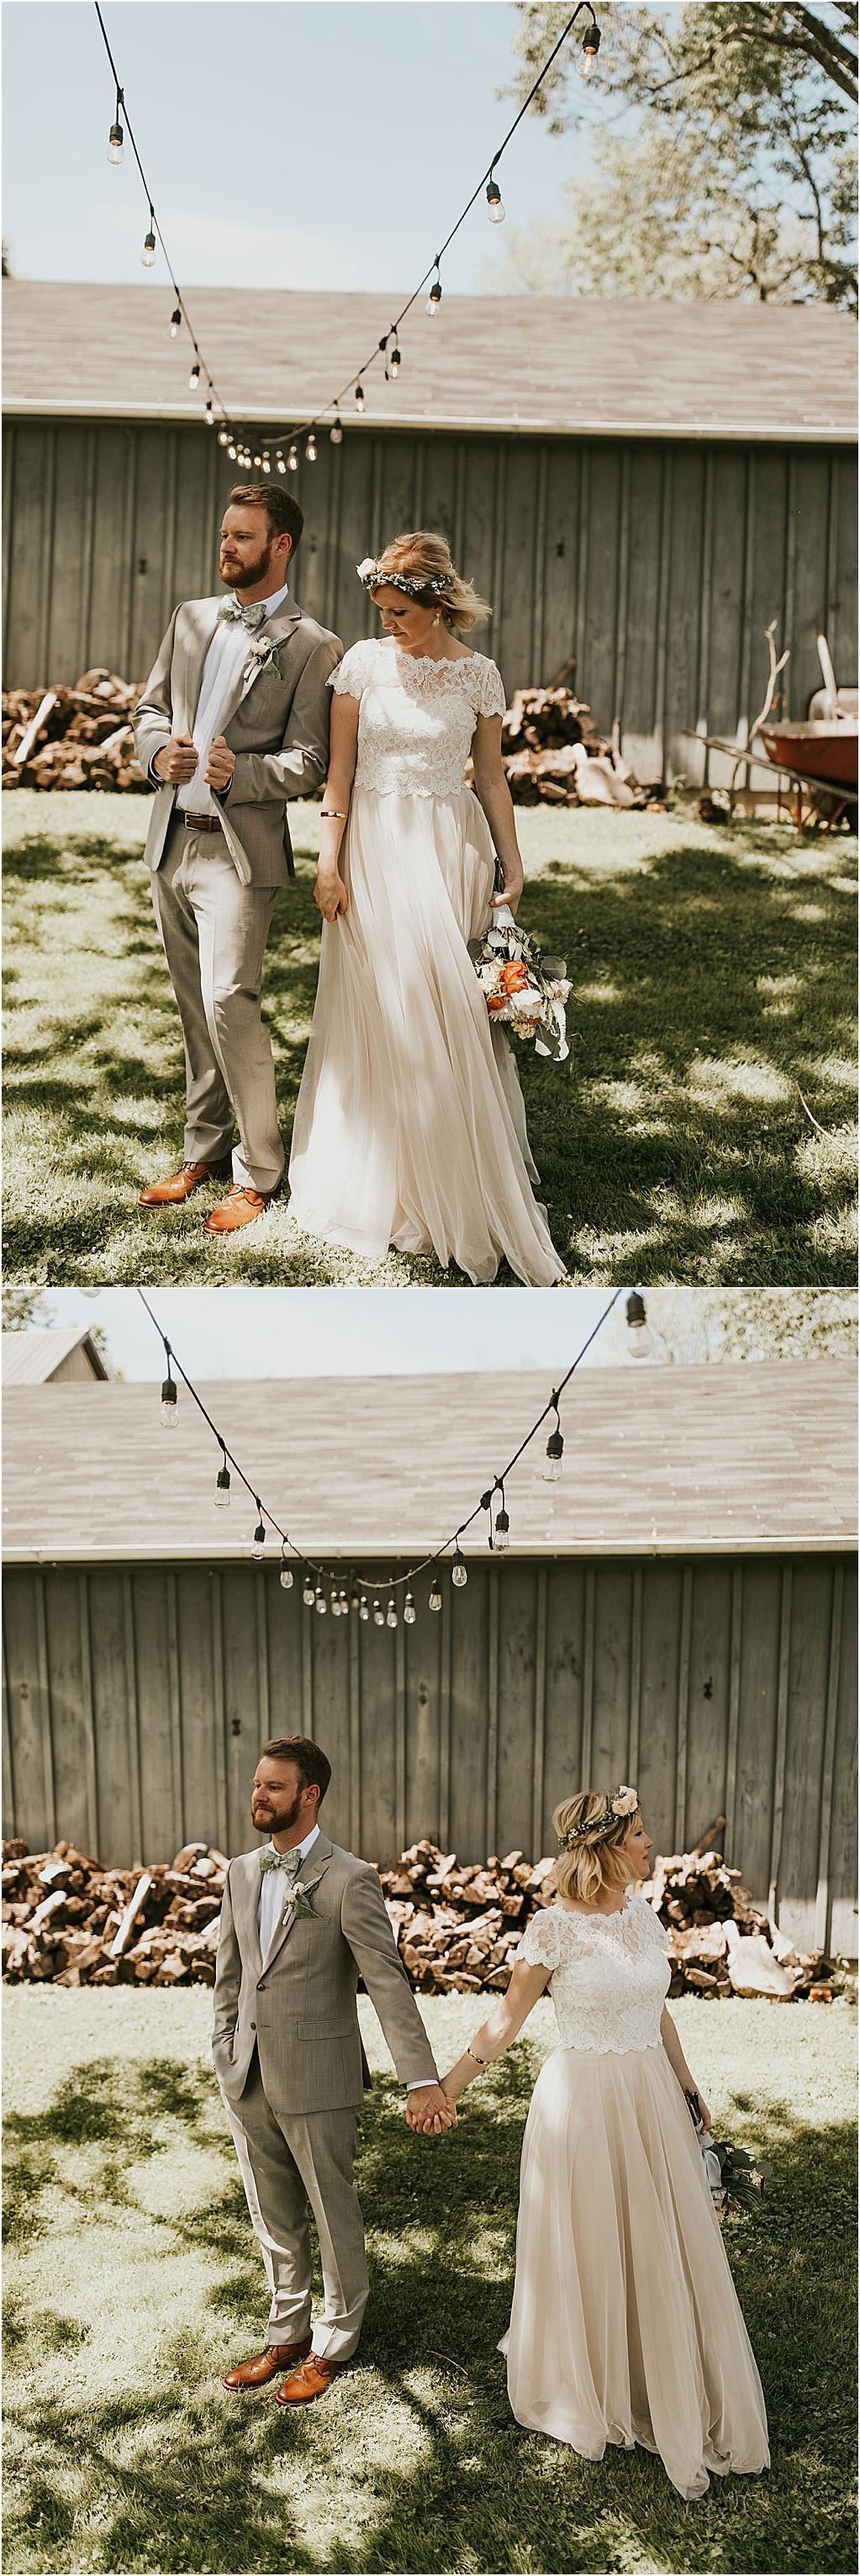 brittany_boote_pennsylvania_wedding_photographer_0436.jpg